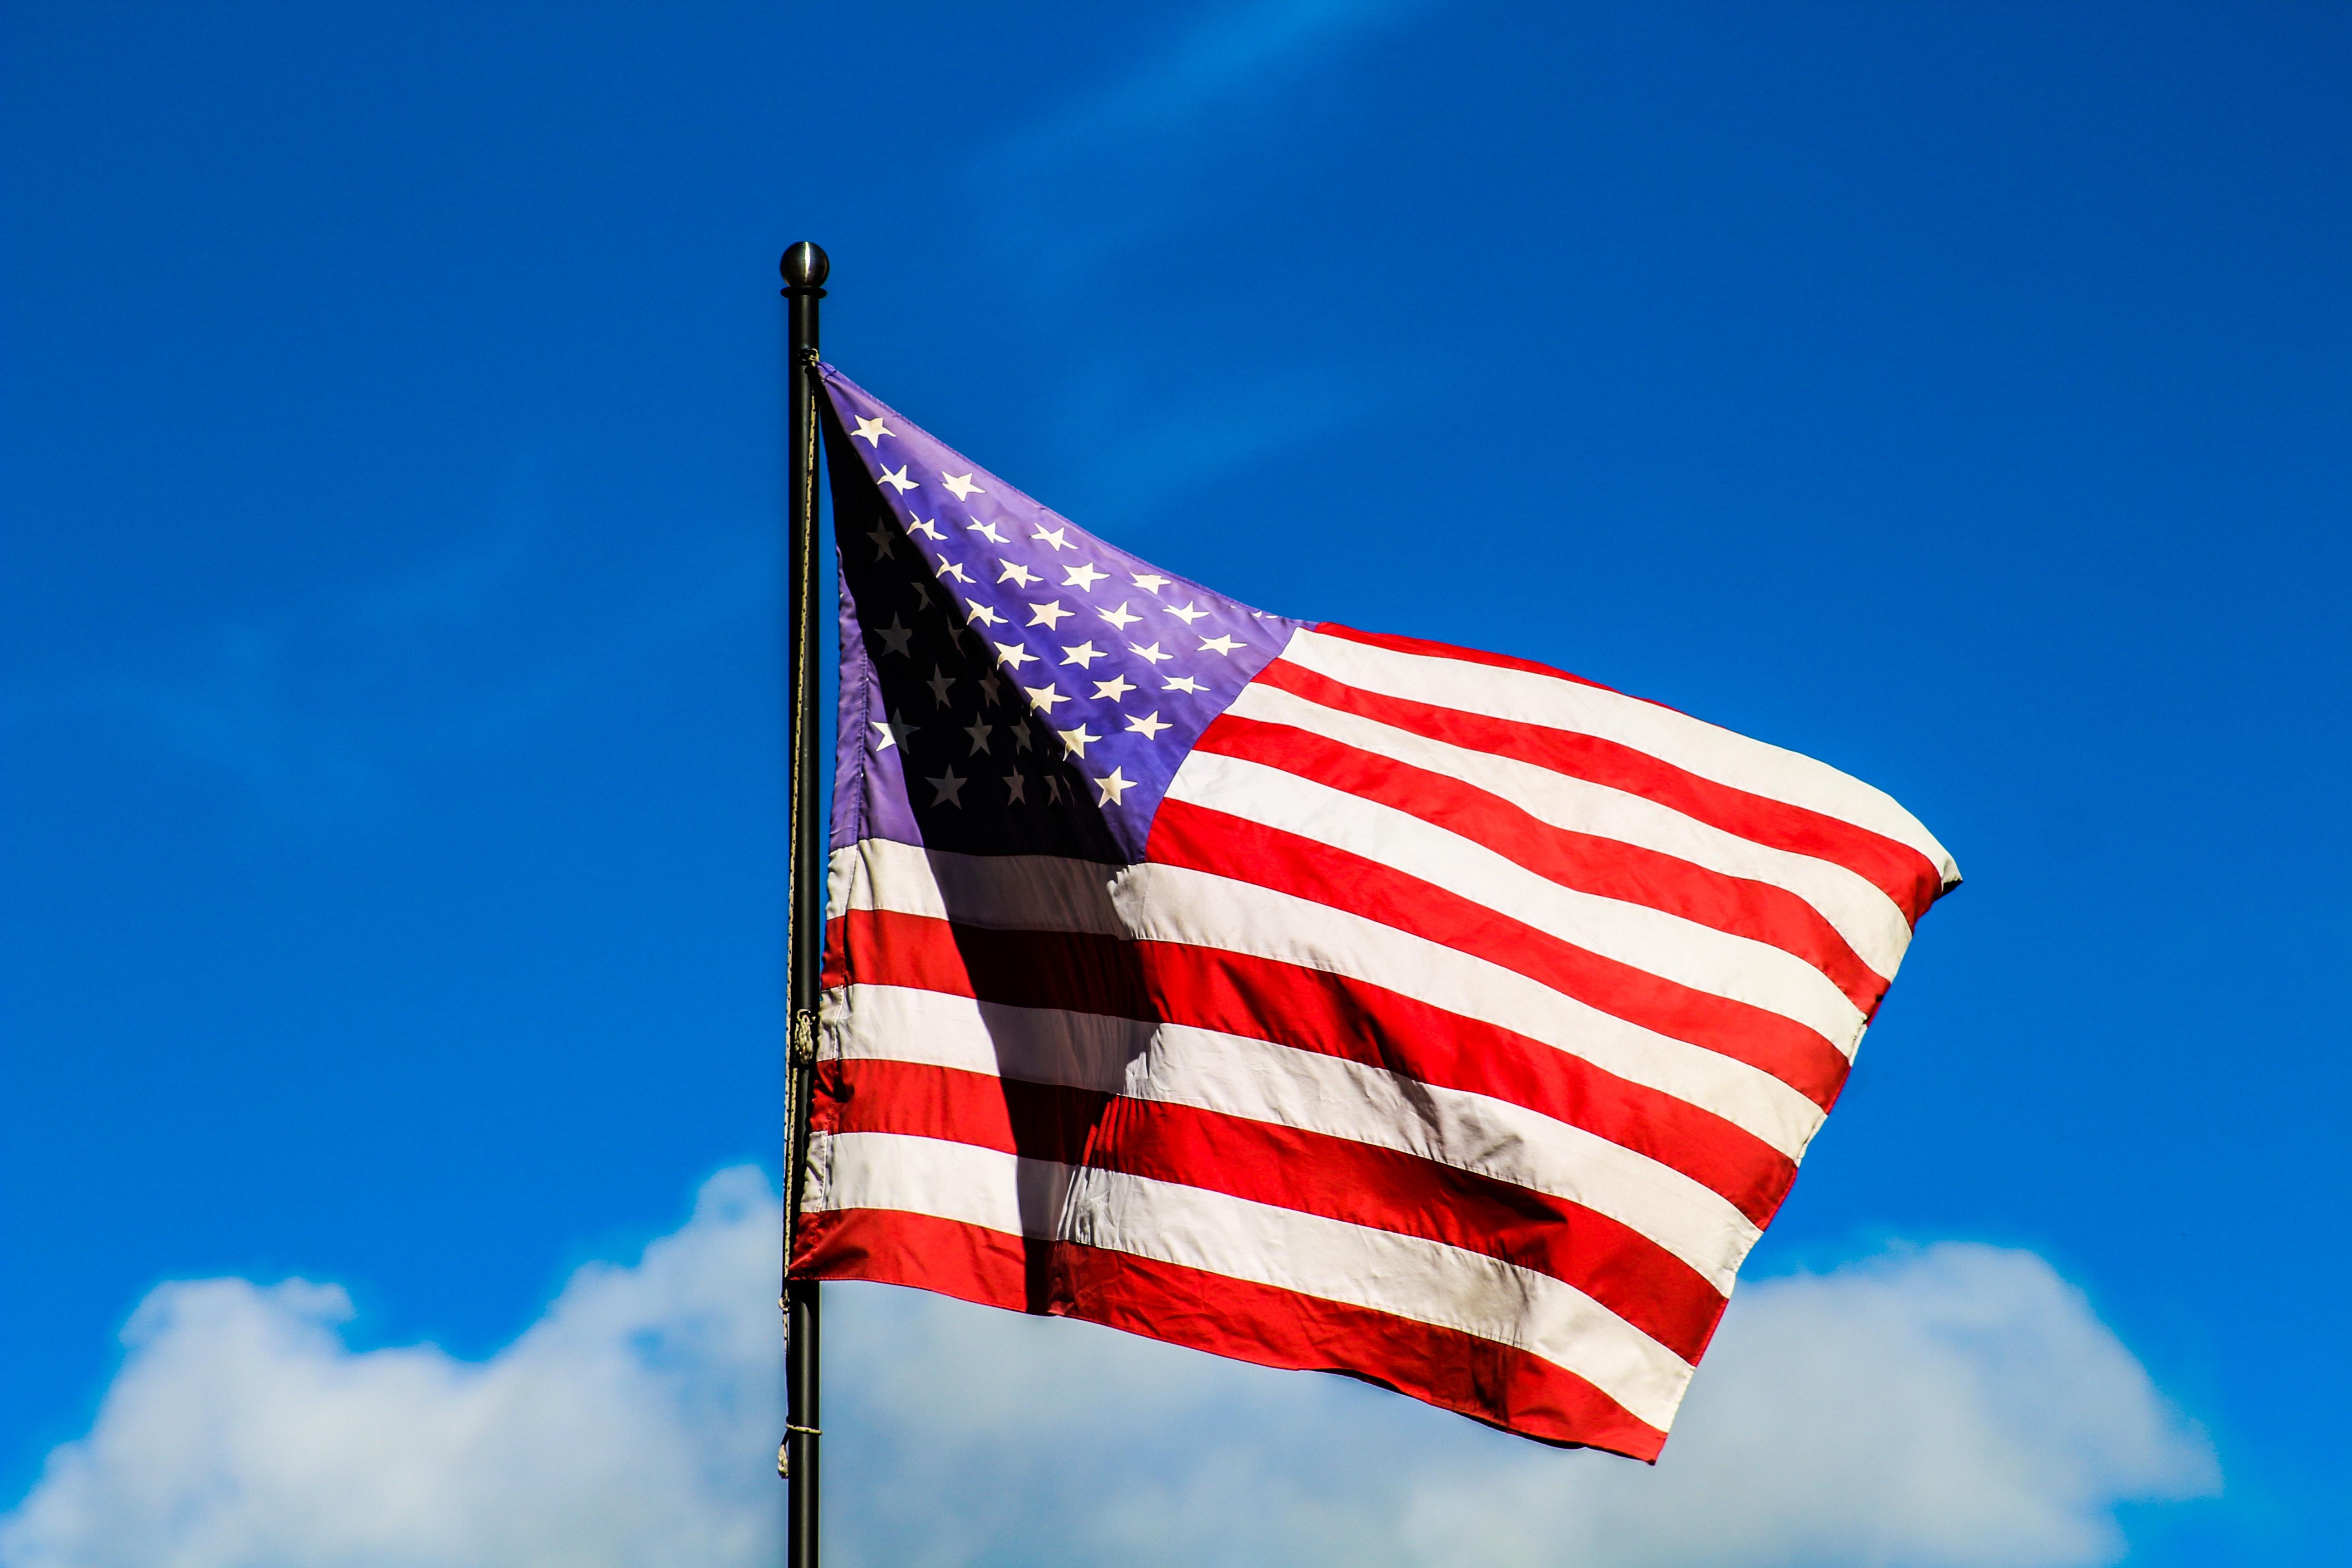 U.S. American flag under clear blue sky